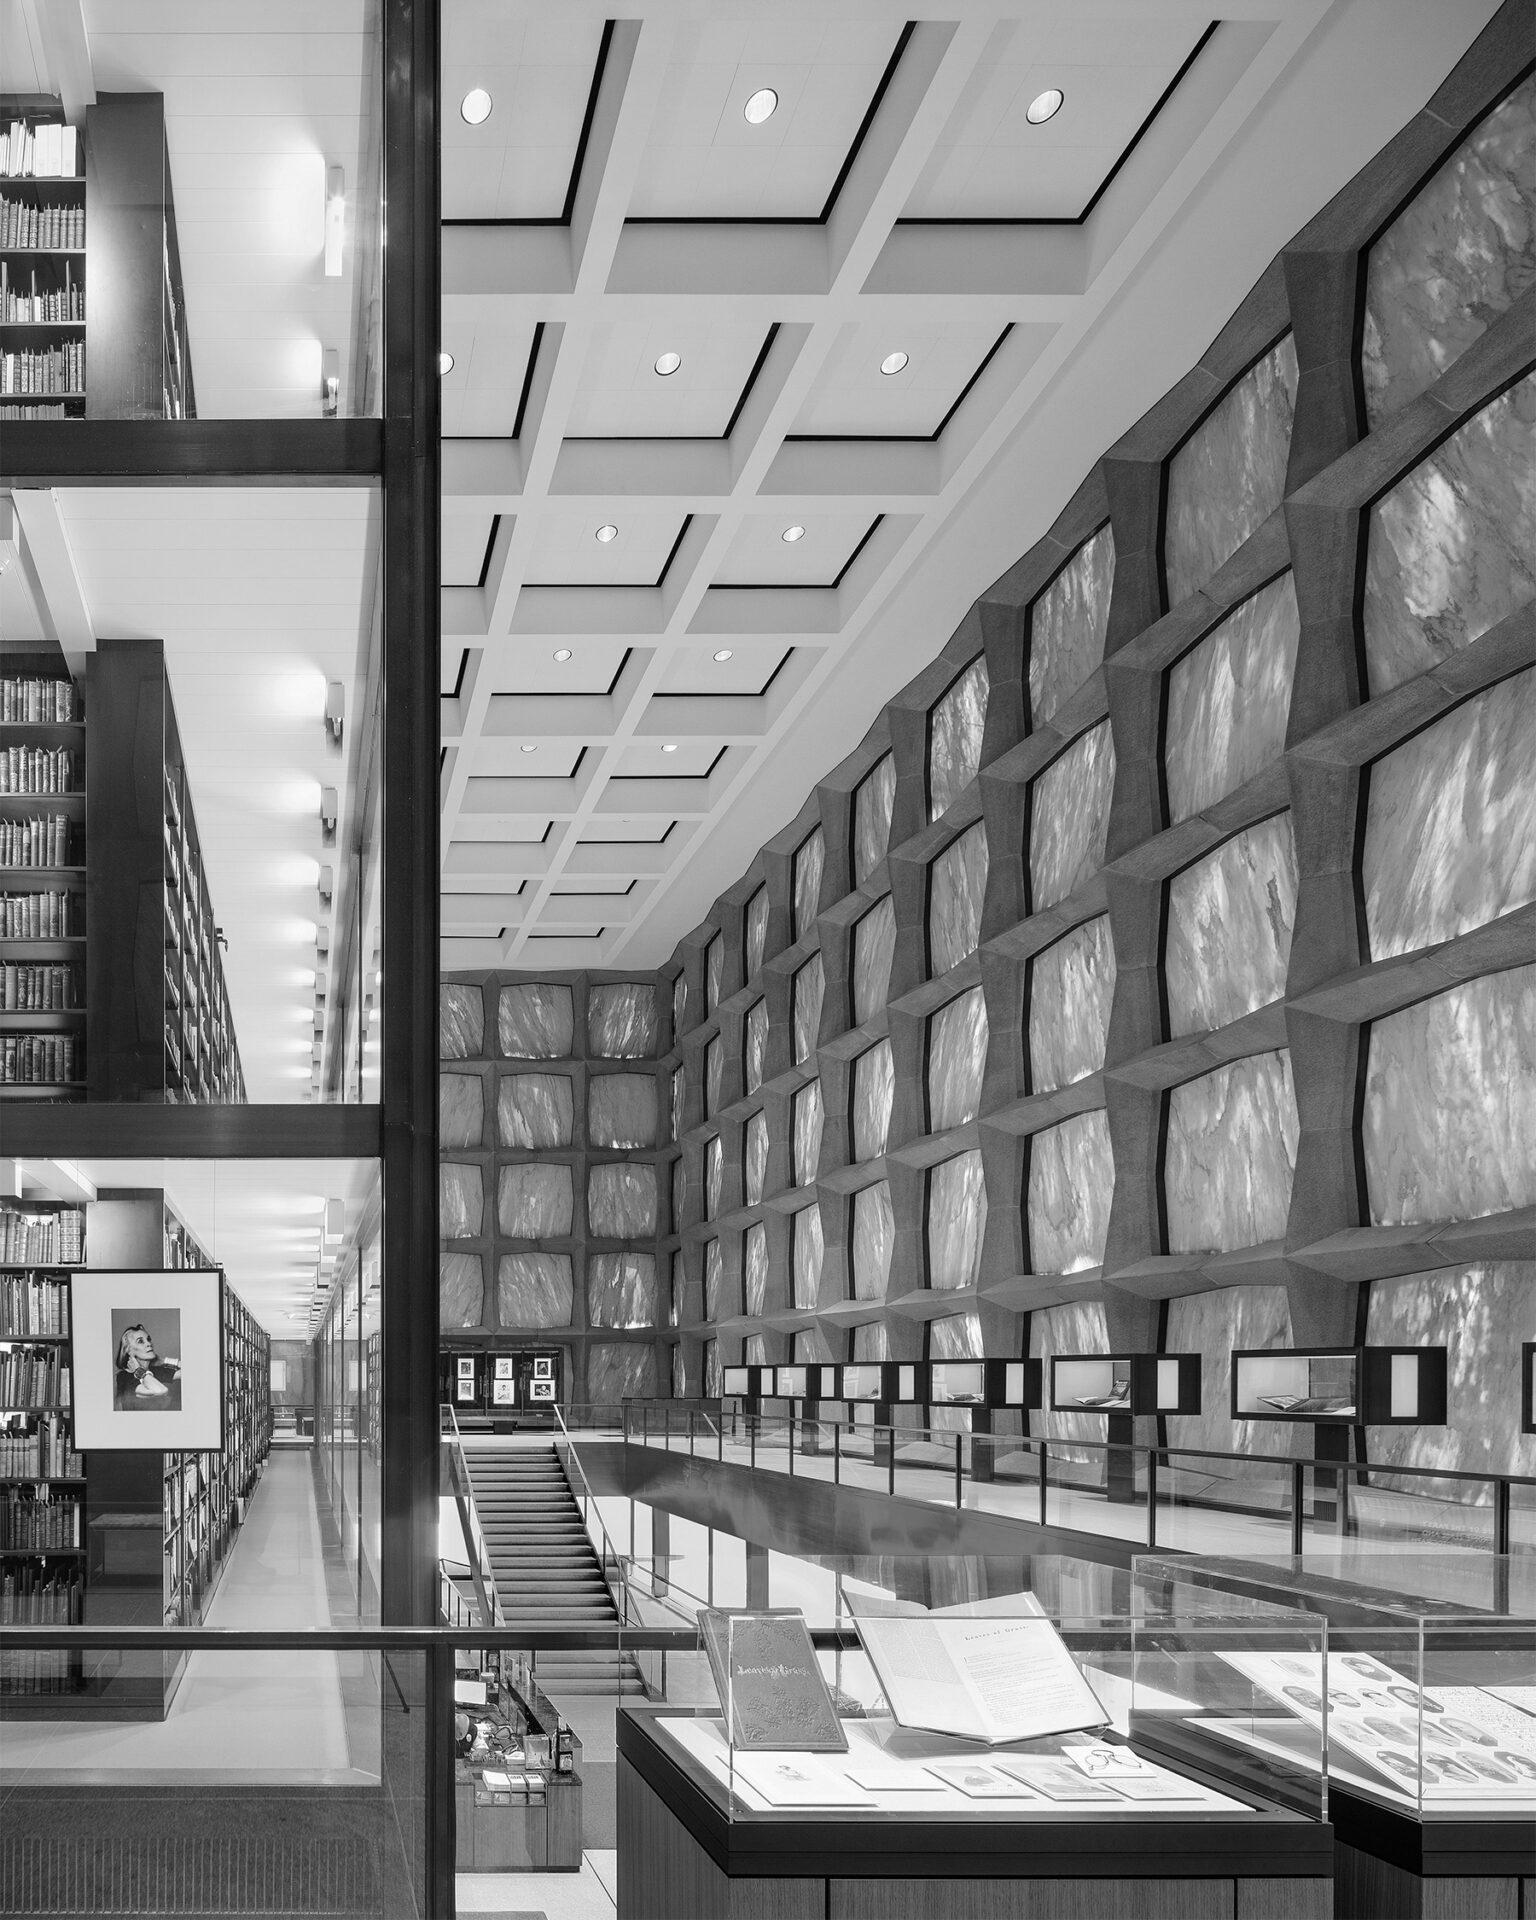 Yale University, Beinecke Rare Book & Manuscript Library | New Haven, CT | SOM, Gordon Bunshaft